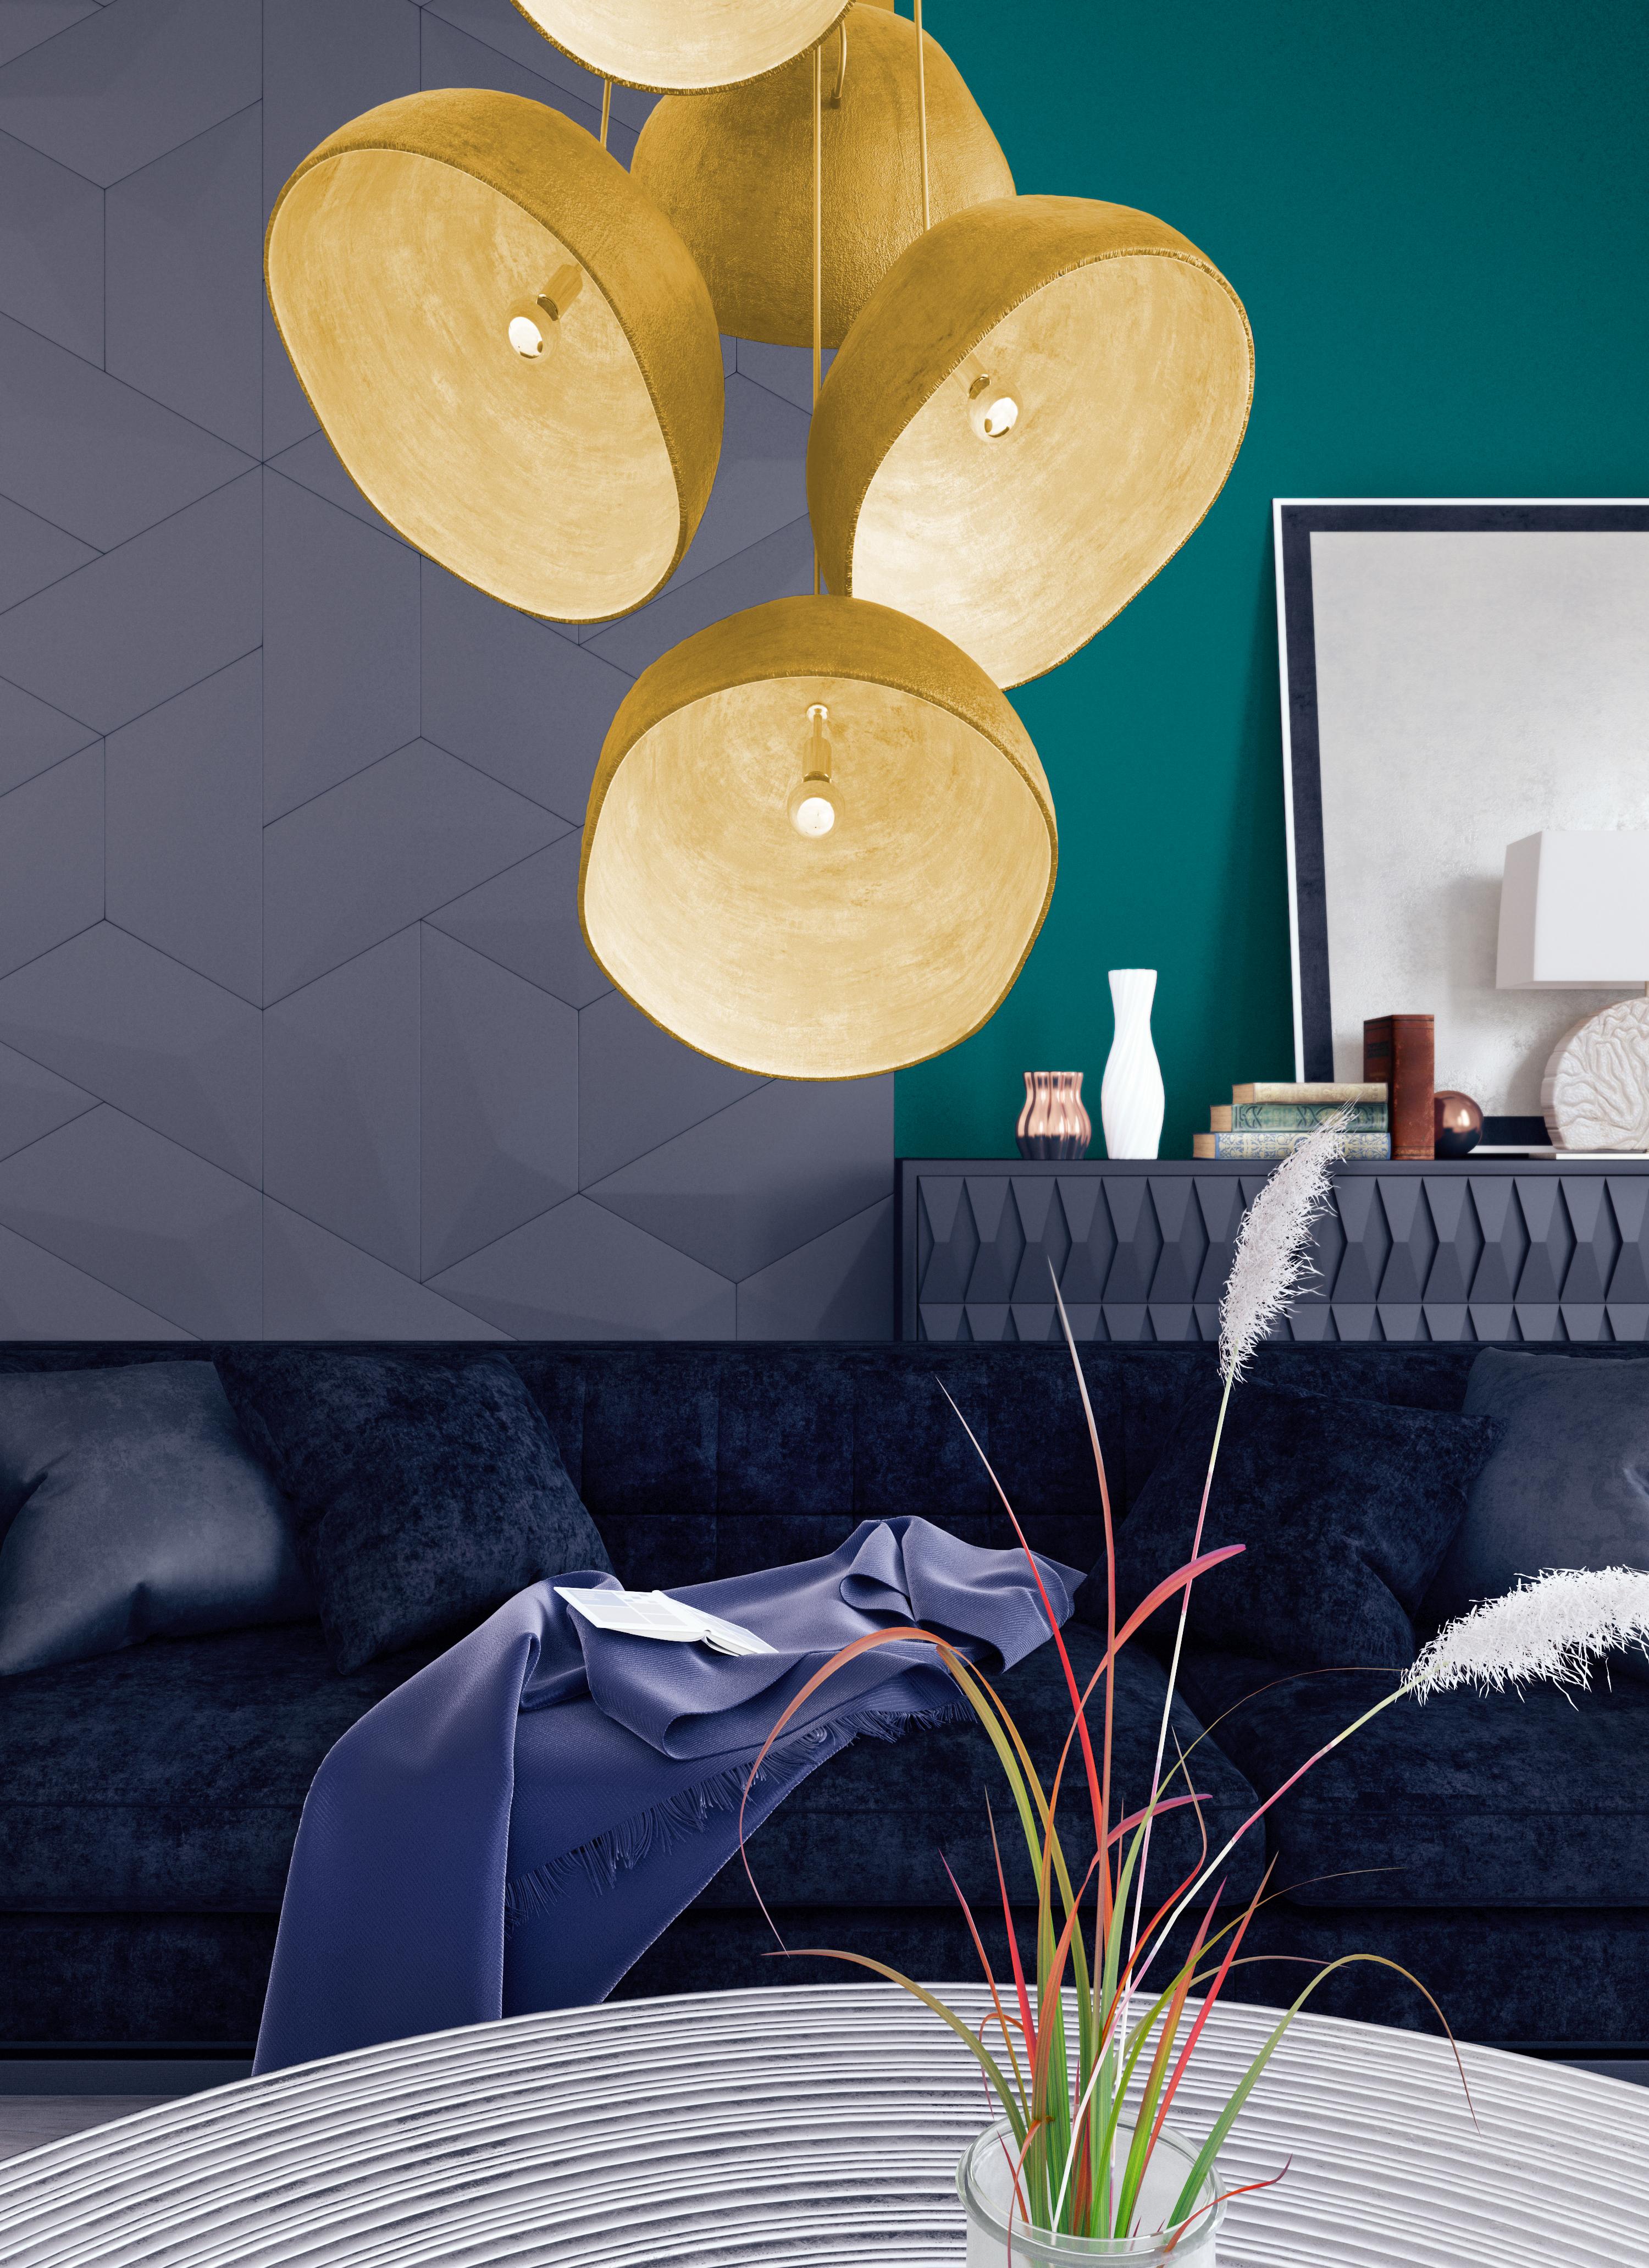 Petrol-Wandfarbe: Cooles, aber elegantes Blaugrün als Innenfarbe ...